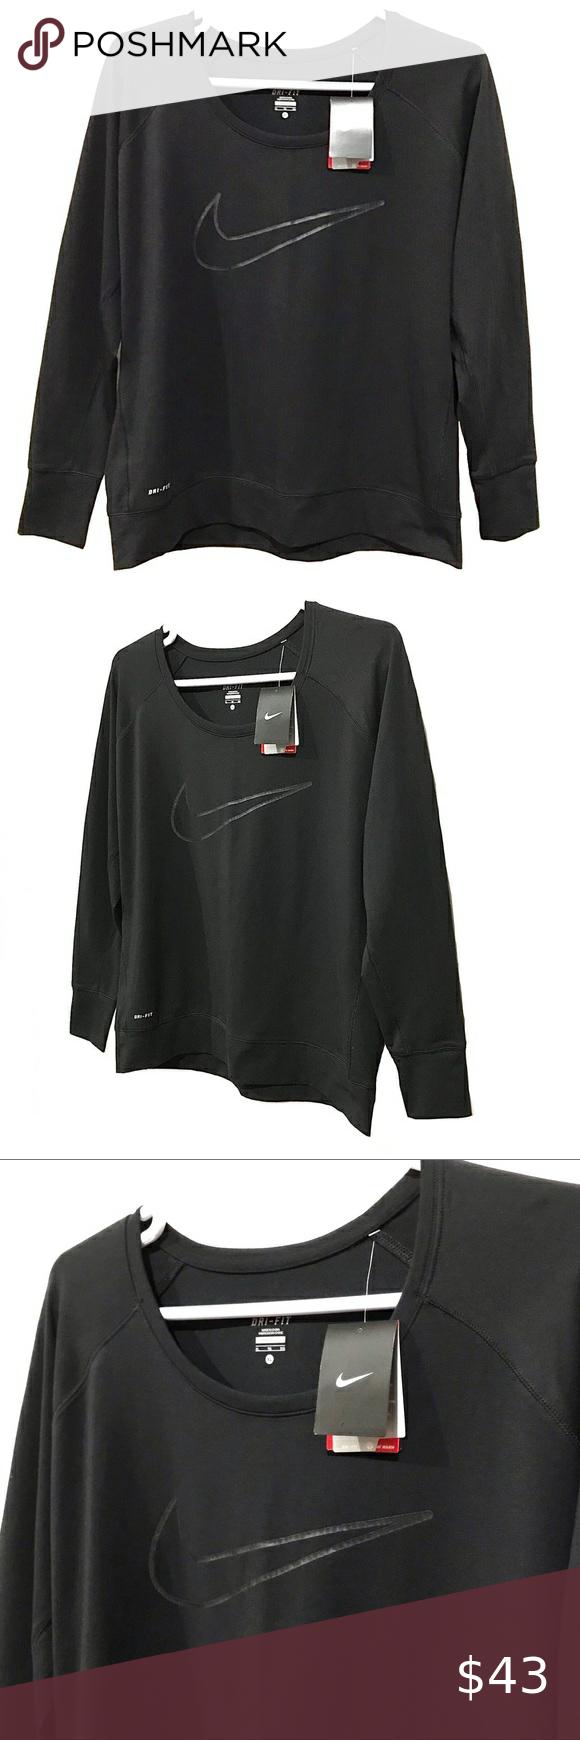 Nike Dri Fit Crewneck Logo Raglan Sweatshirt Raglan Sweatshirts Sweatshirts Nike Dri Fit [ 1740 x 580 Pixel ]